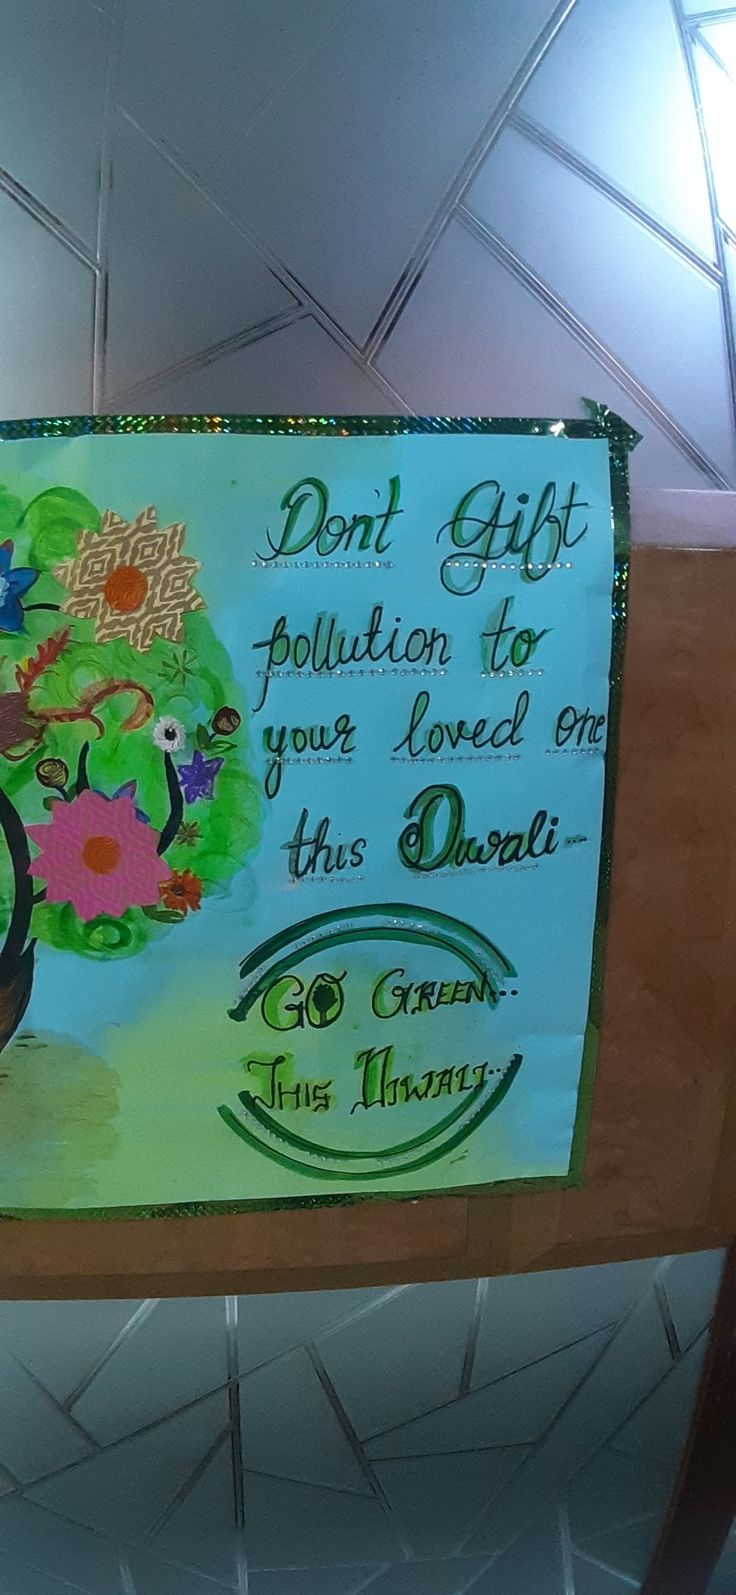 Green Diwali Slogan GreenDiwali Postermaking Diwali